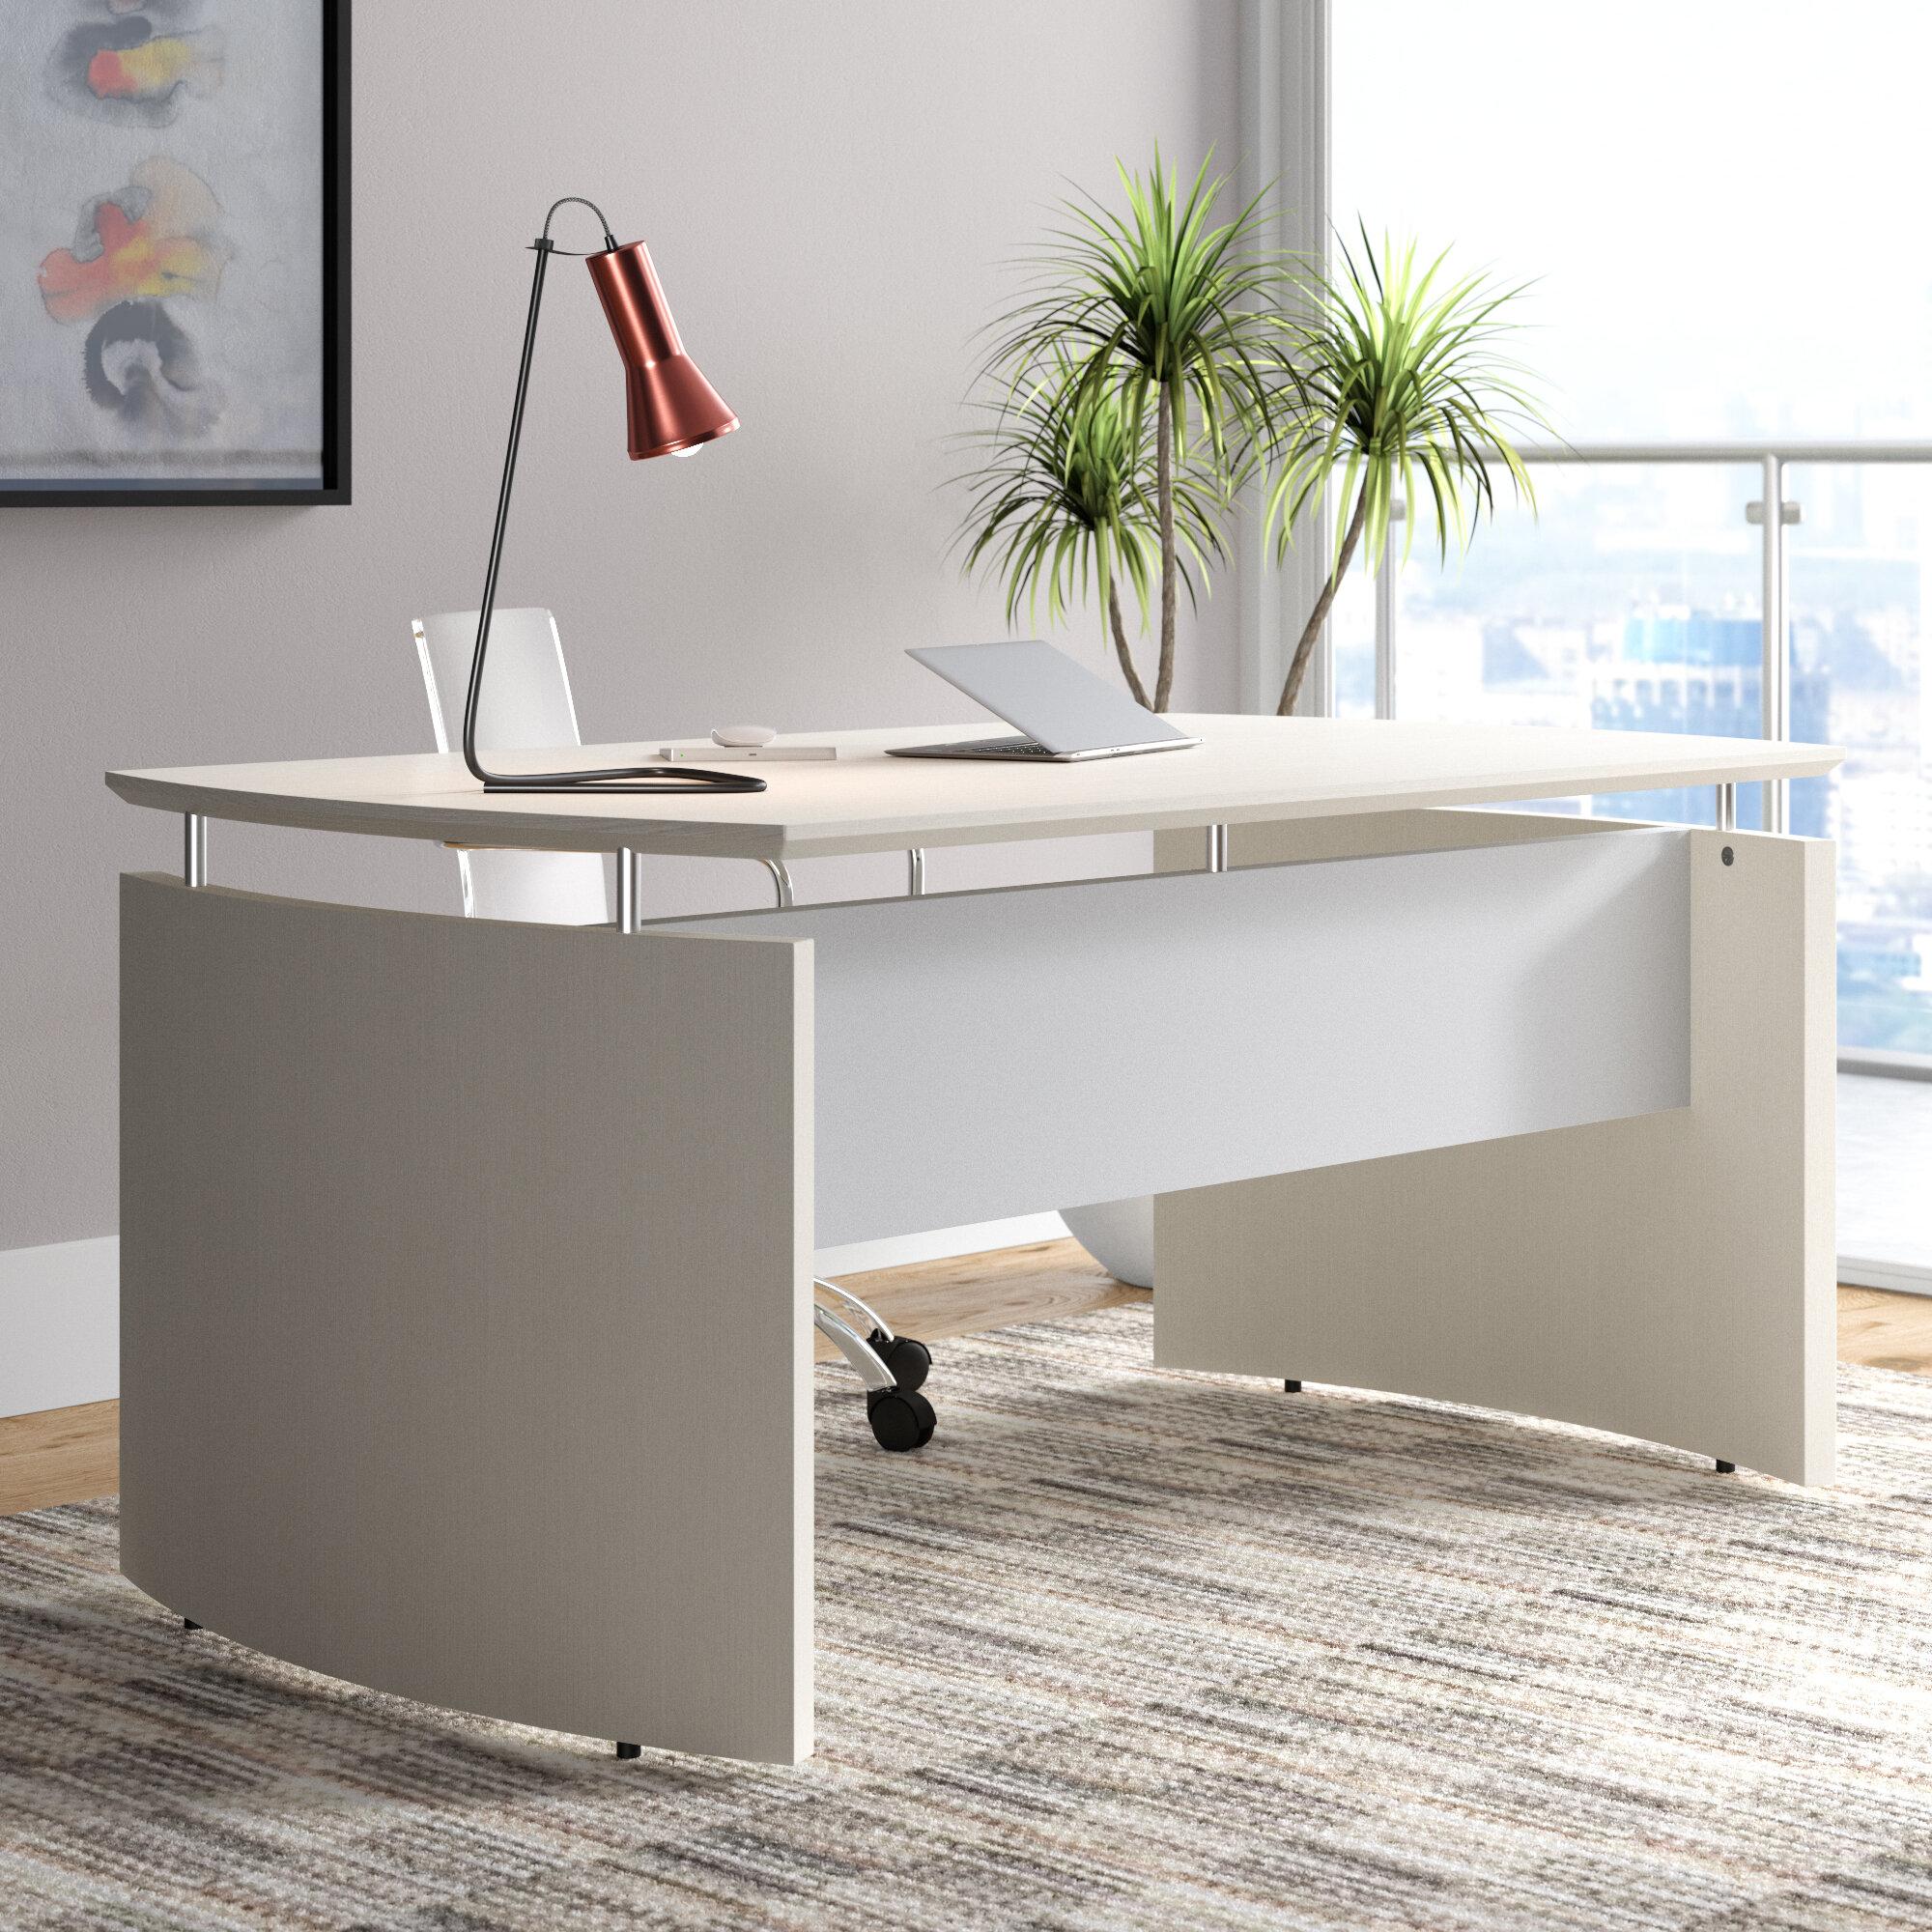 Drafting Tables You Ll Love In 2020 Wayfair